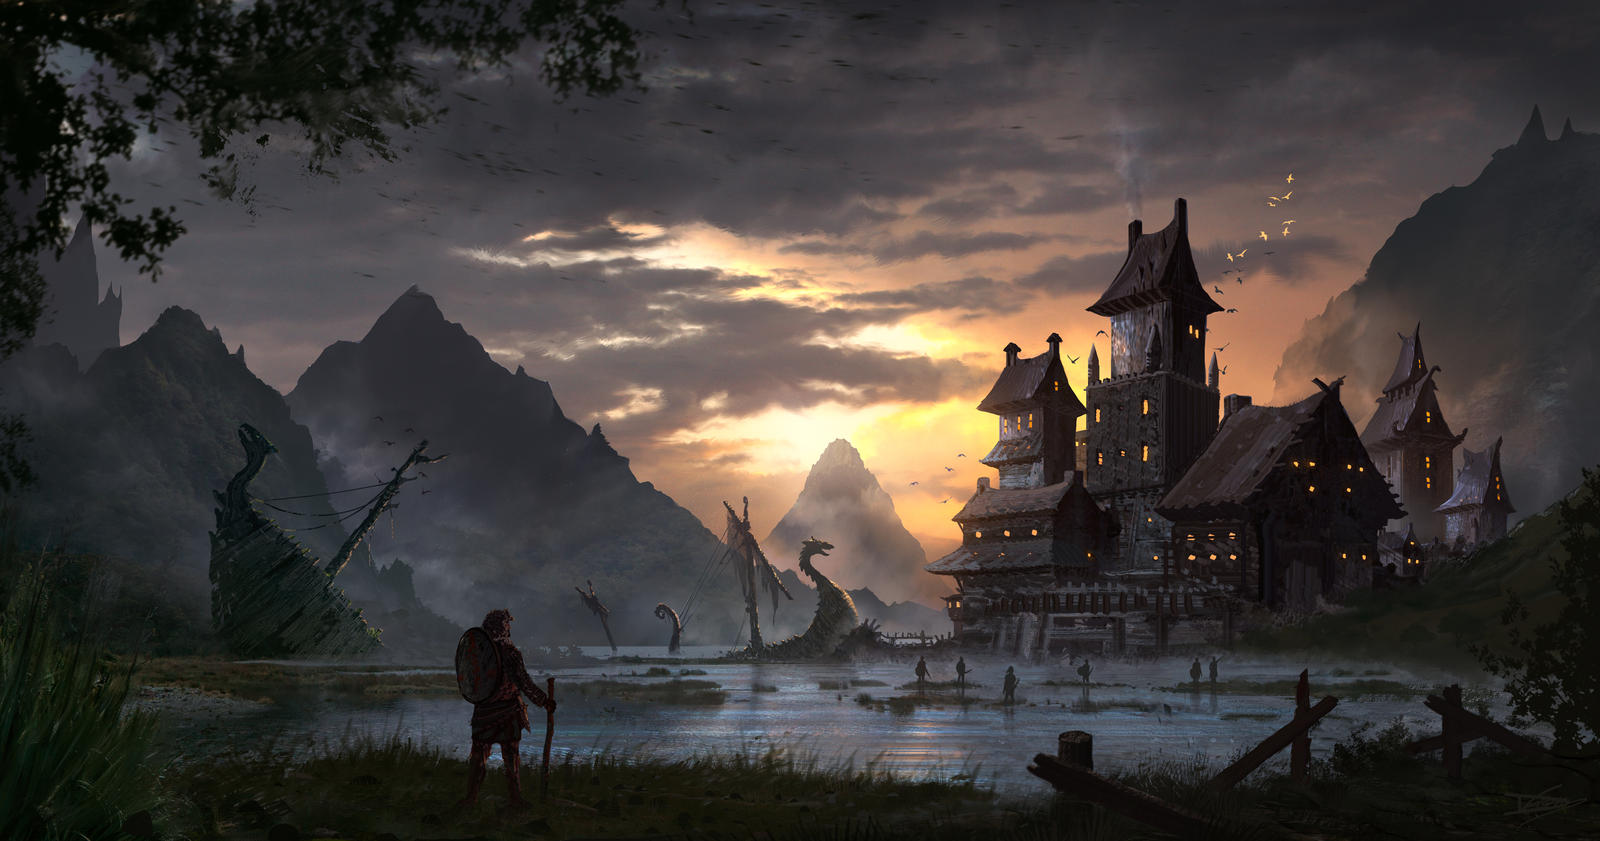 Daybreak by DominiquevVelsen